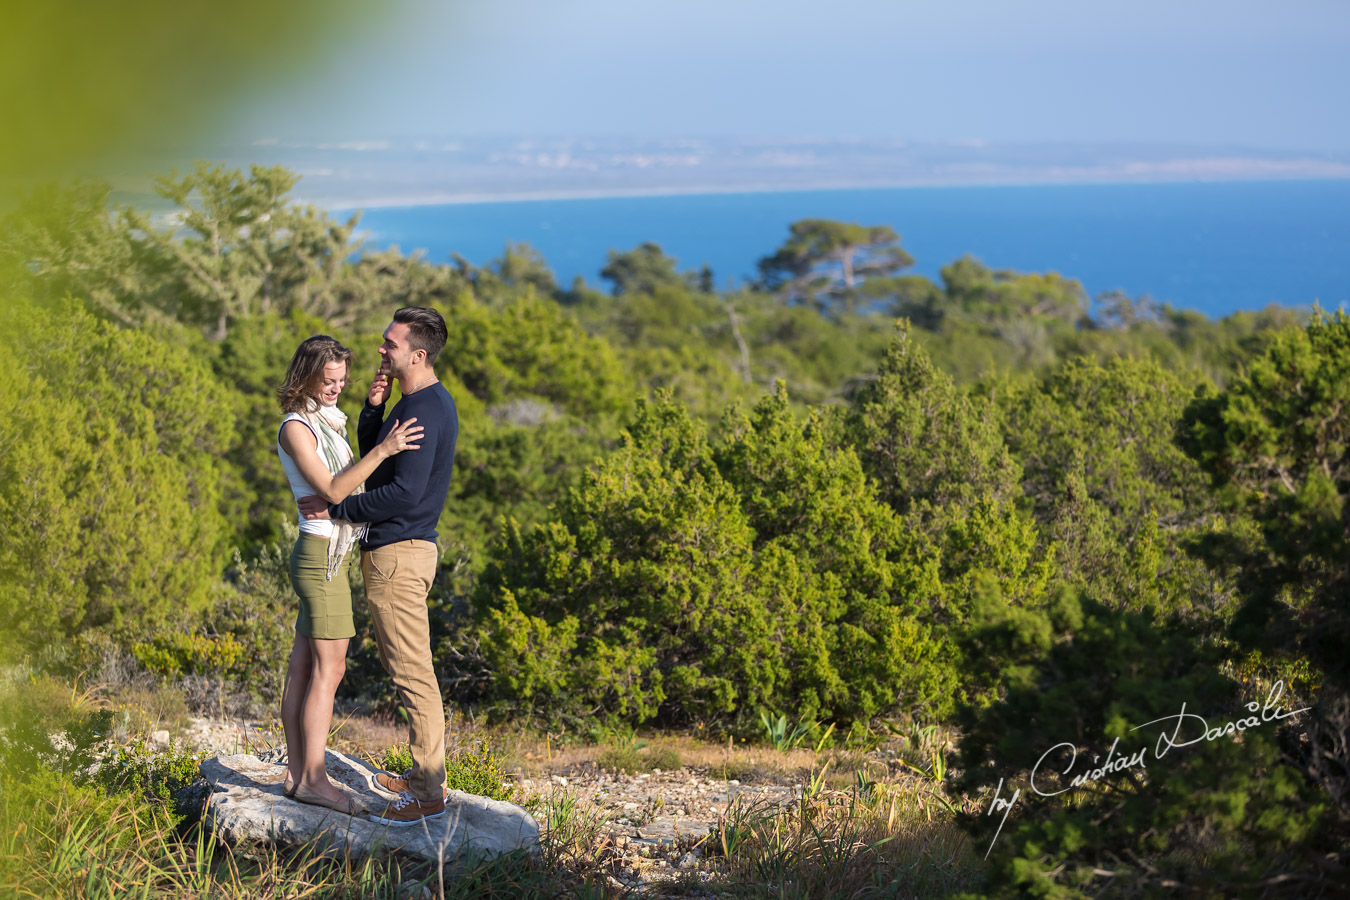 Love at first sight - Karen & Martins at Kurion Cyprus - 01